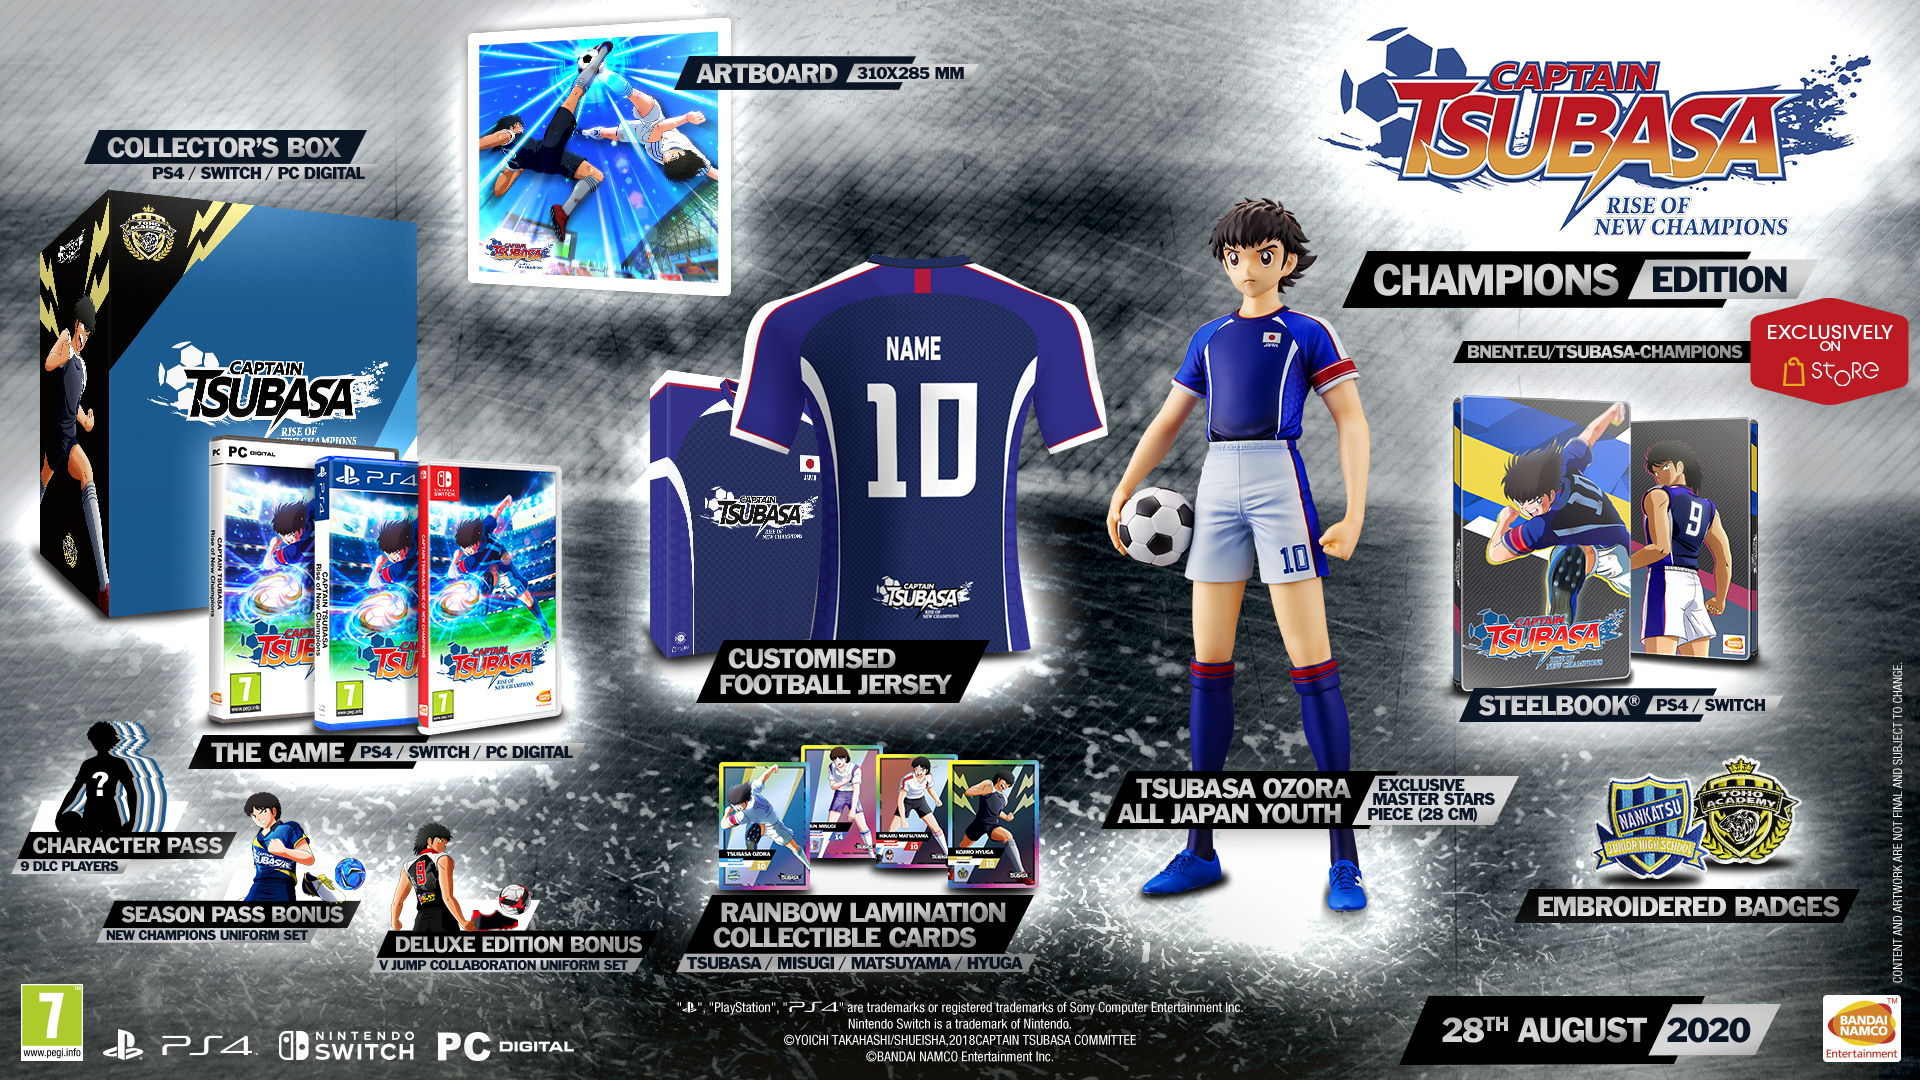 Captain Tsubasa Rise of New Champions Champions Edition